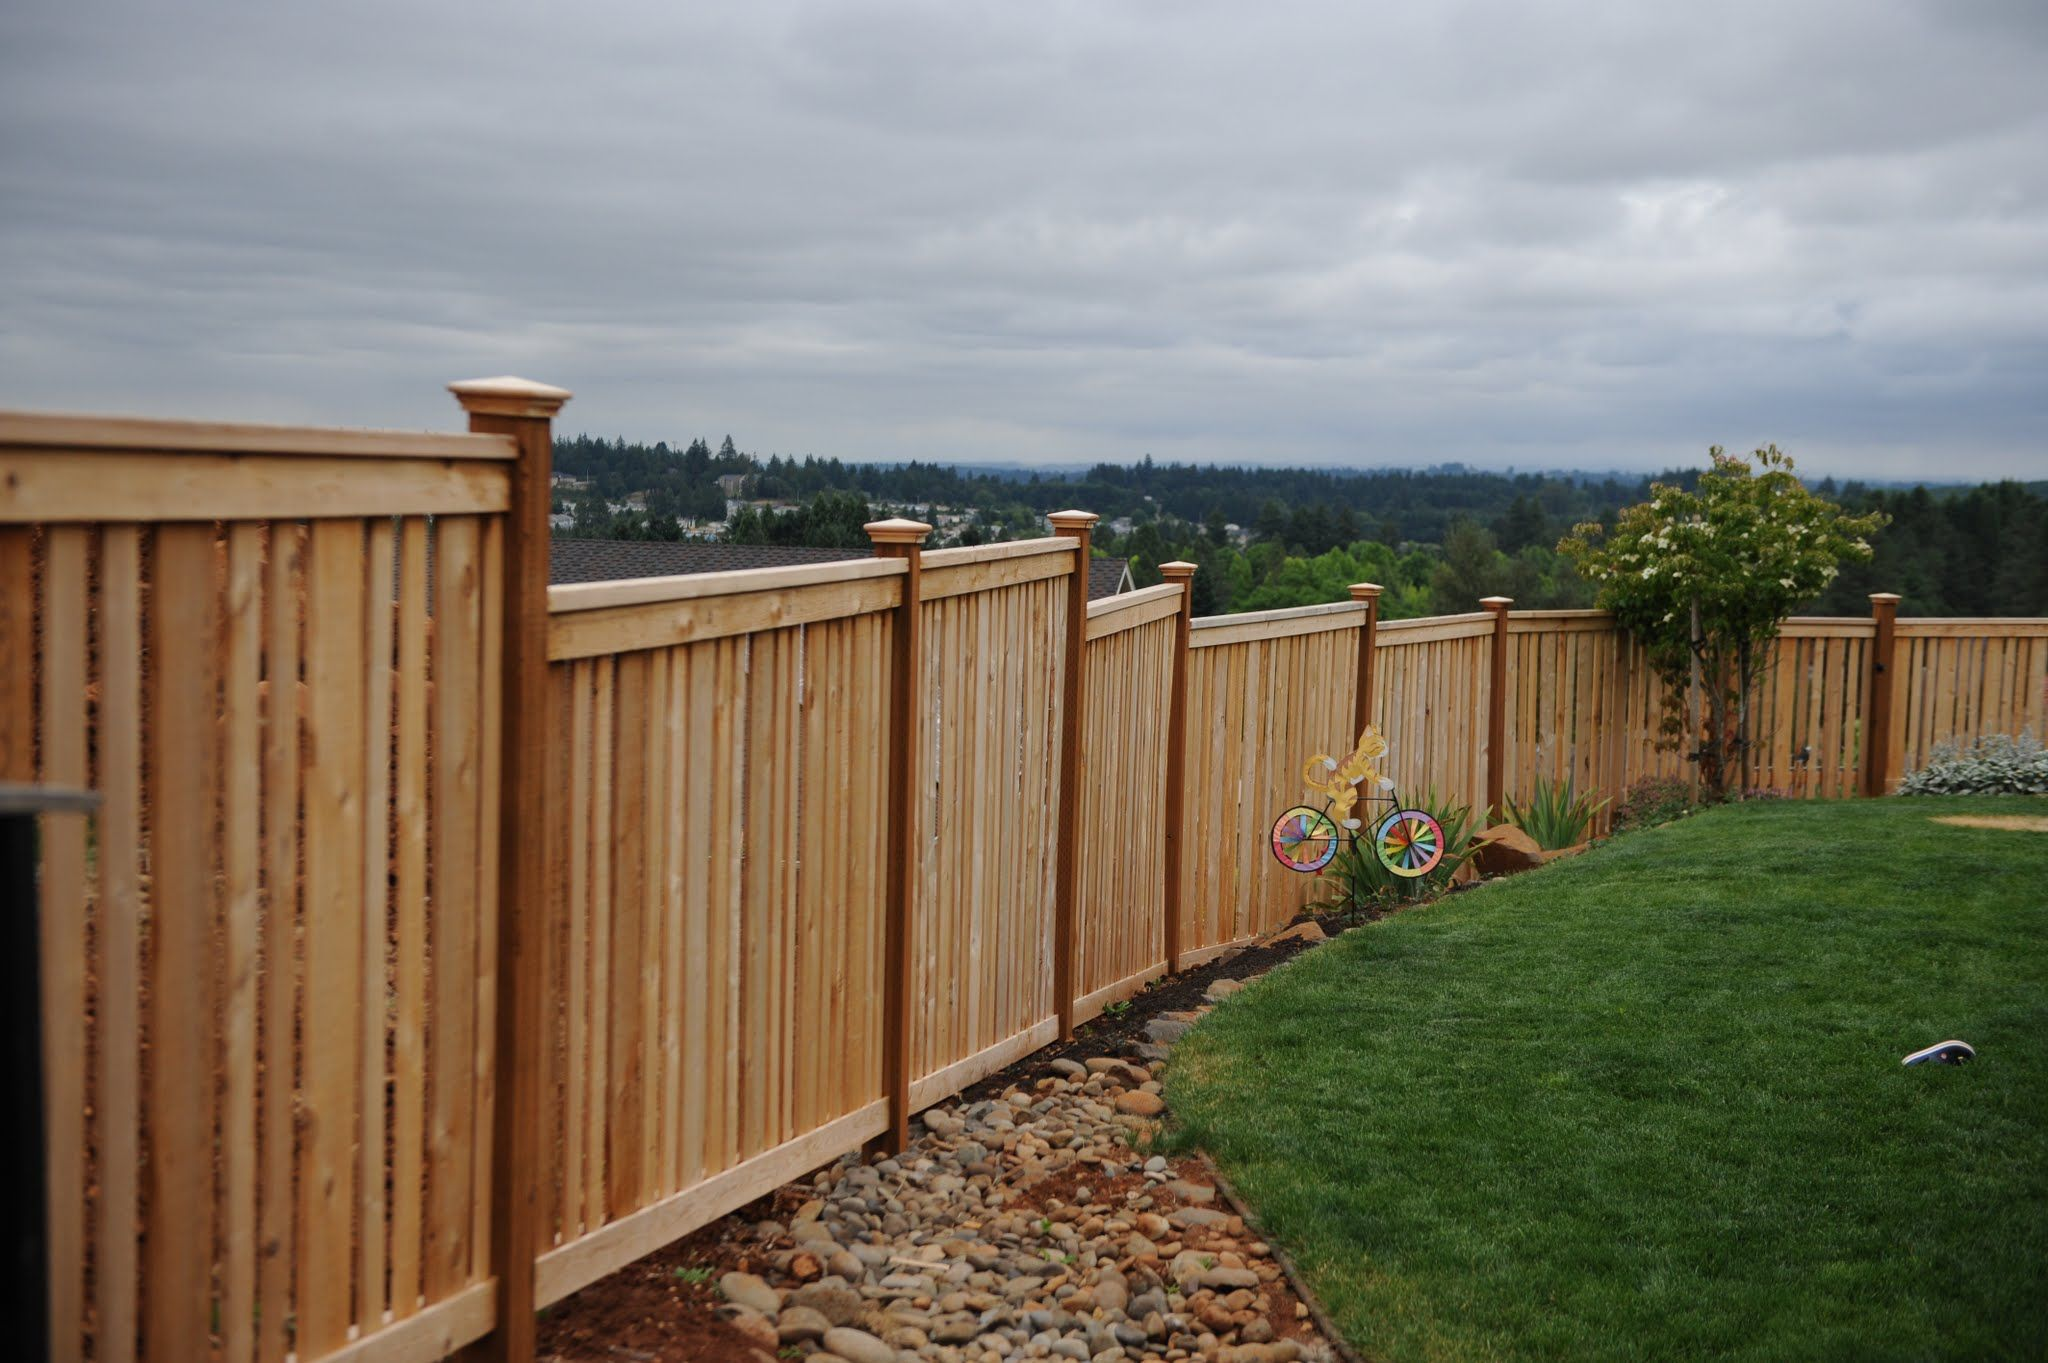 Cedar Wood Fences Oregon Washington Rick S Custom Fencing Decking House Fence Design Fence Design Backyard Fences